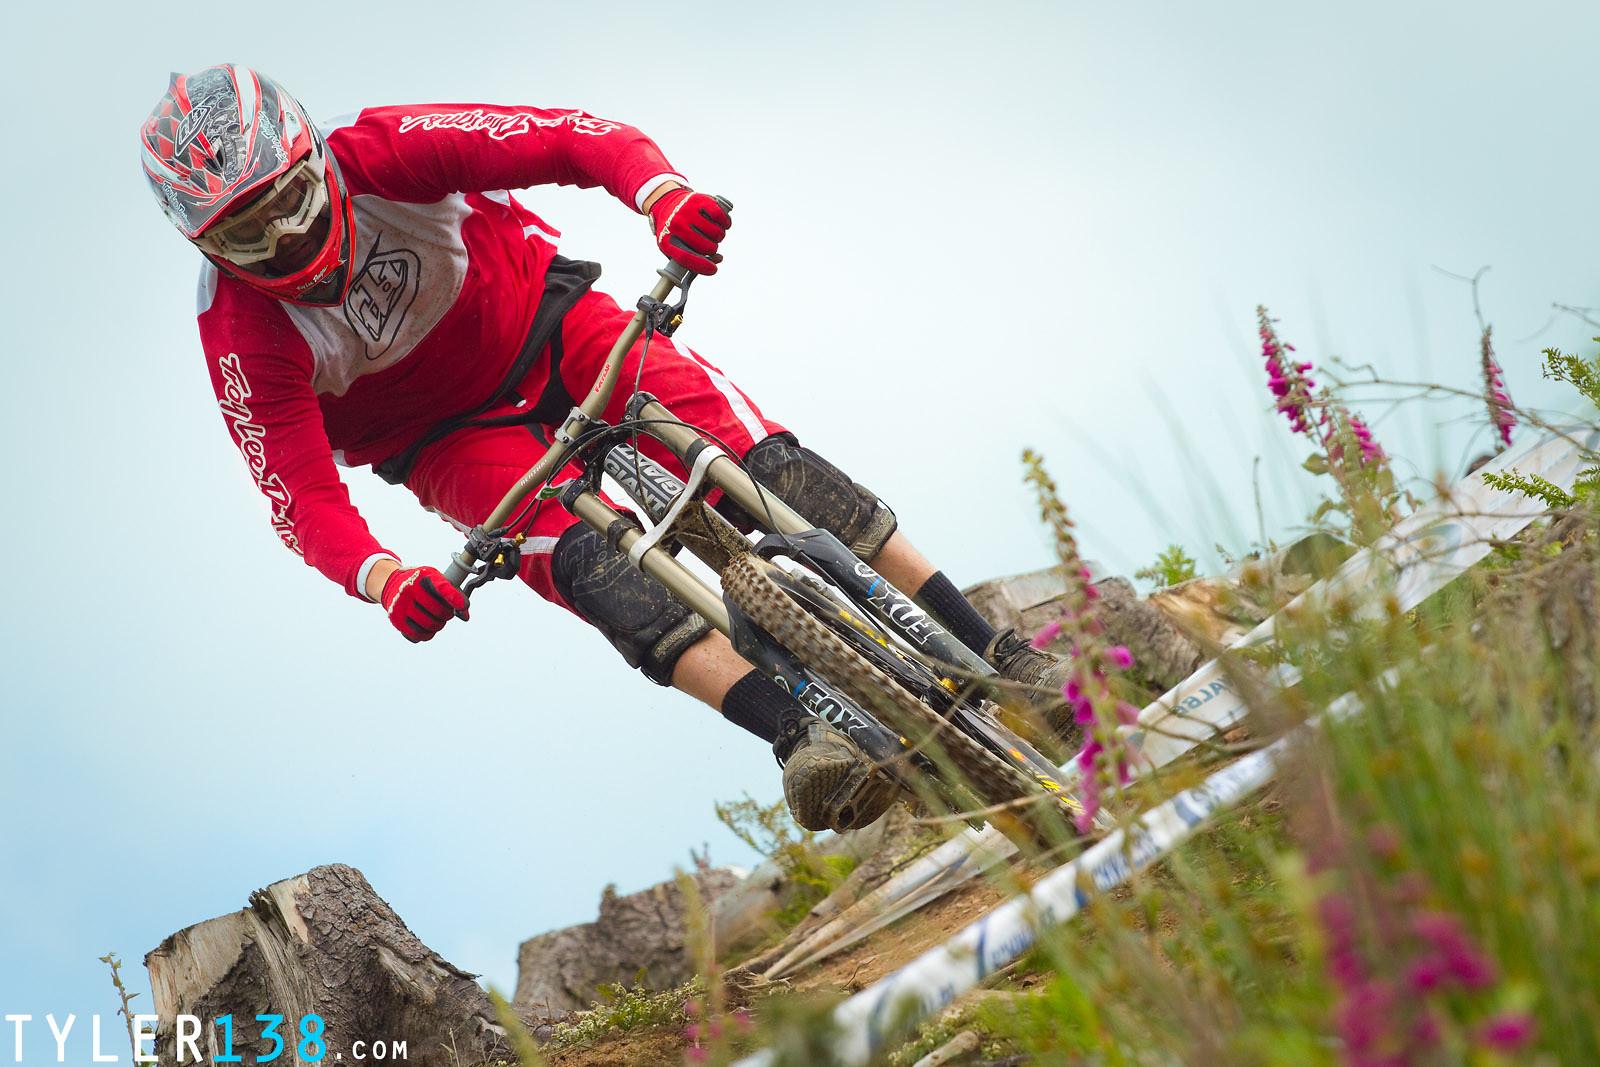 Caersws Cup Rnd 1 2011 - Tyler138 - Mountain Biking Pictures - Vital MTB